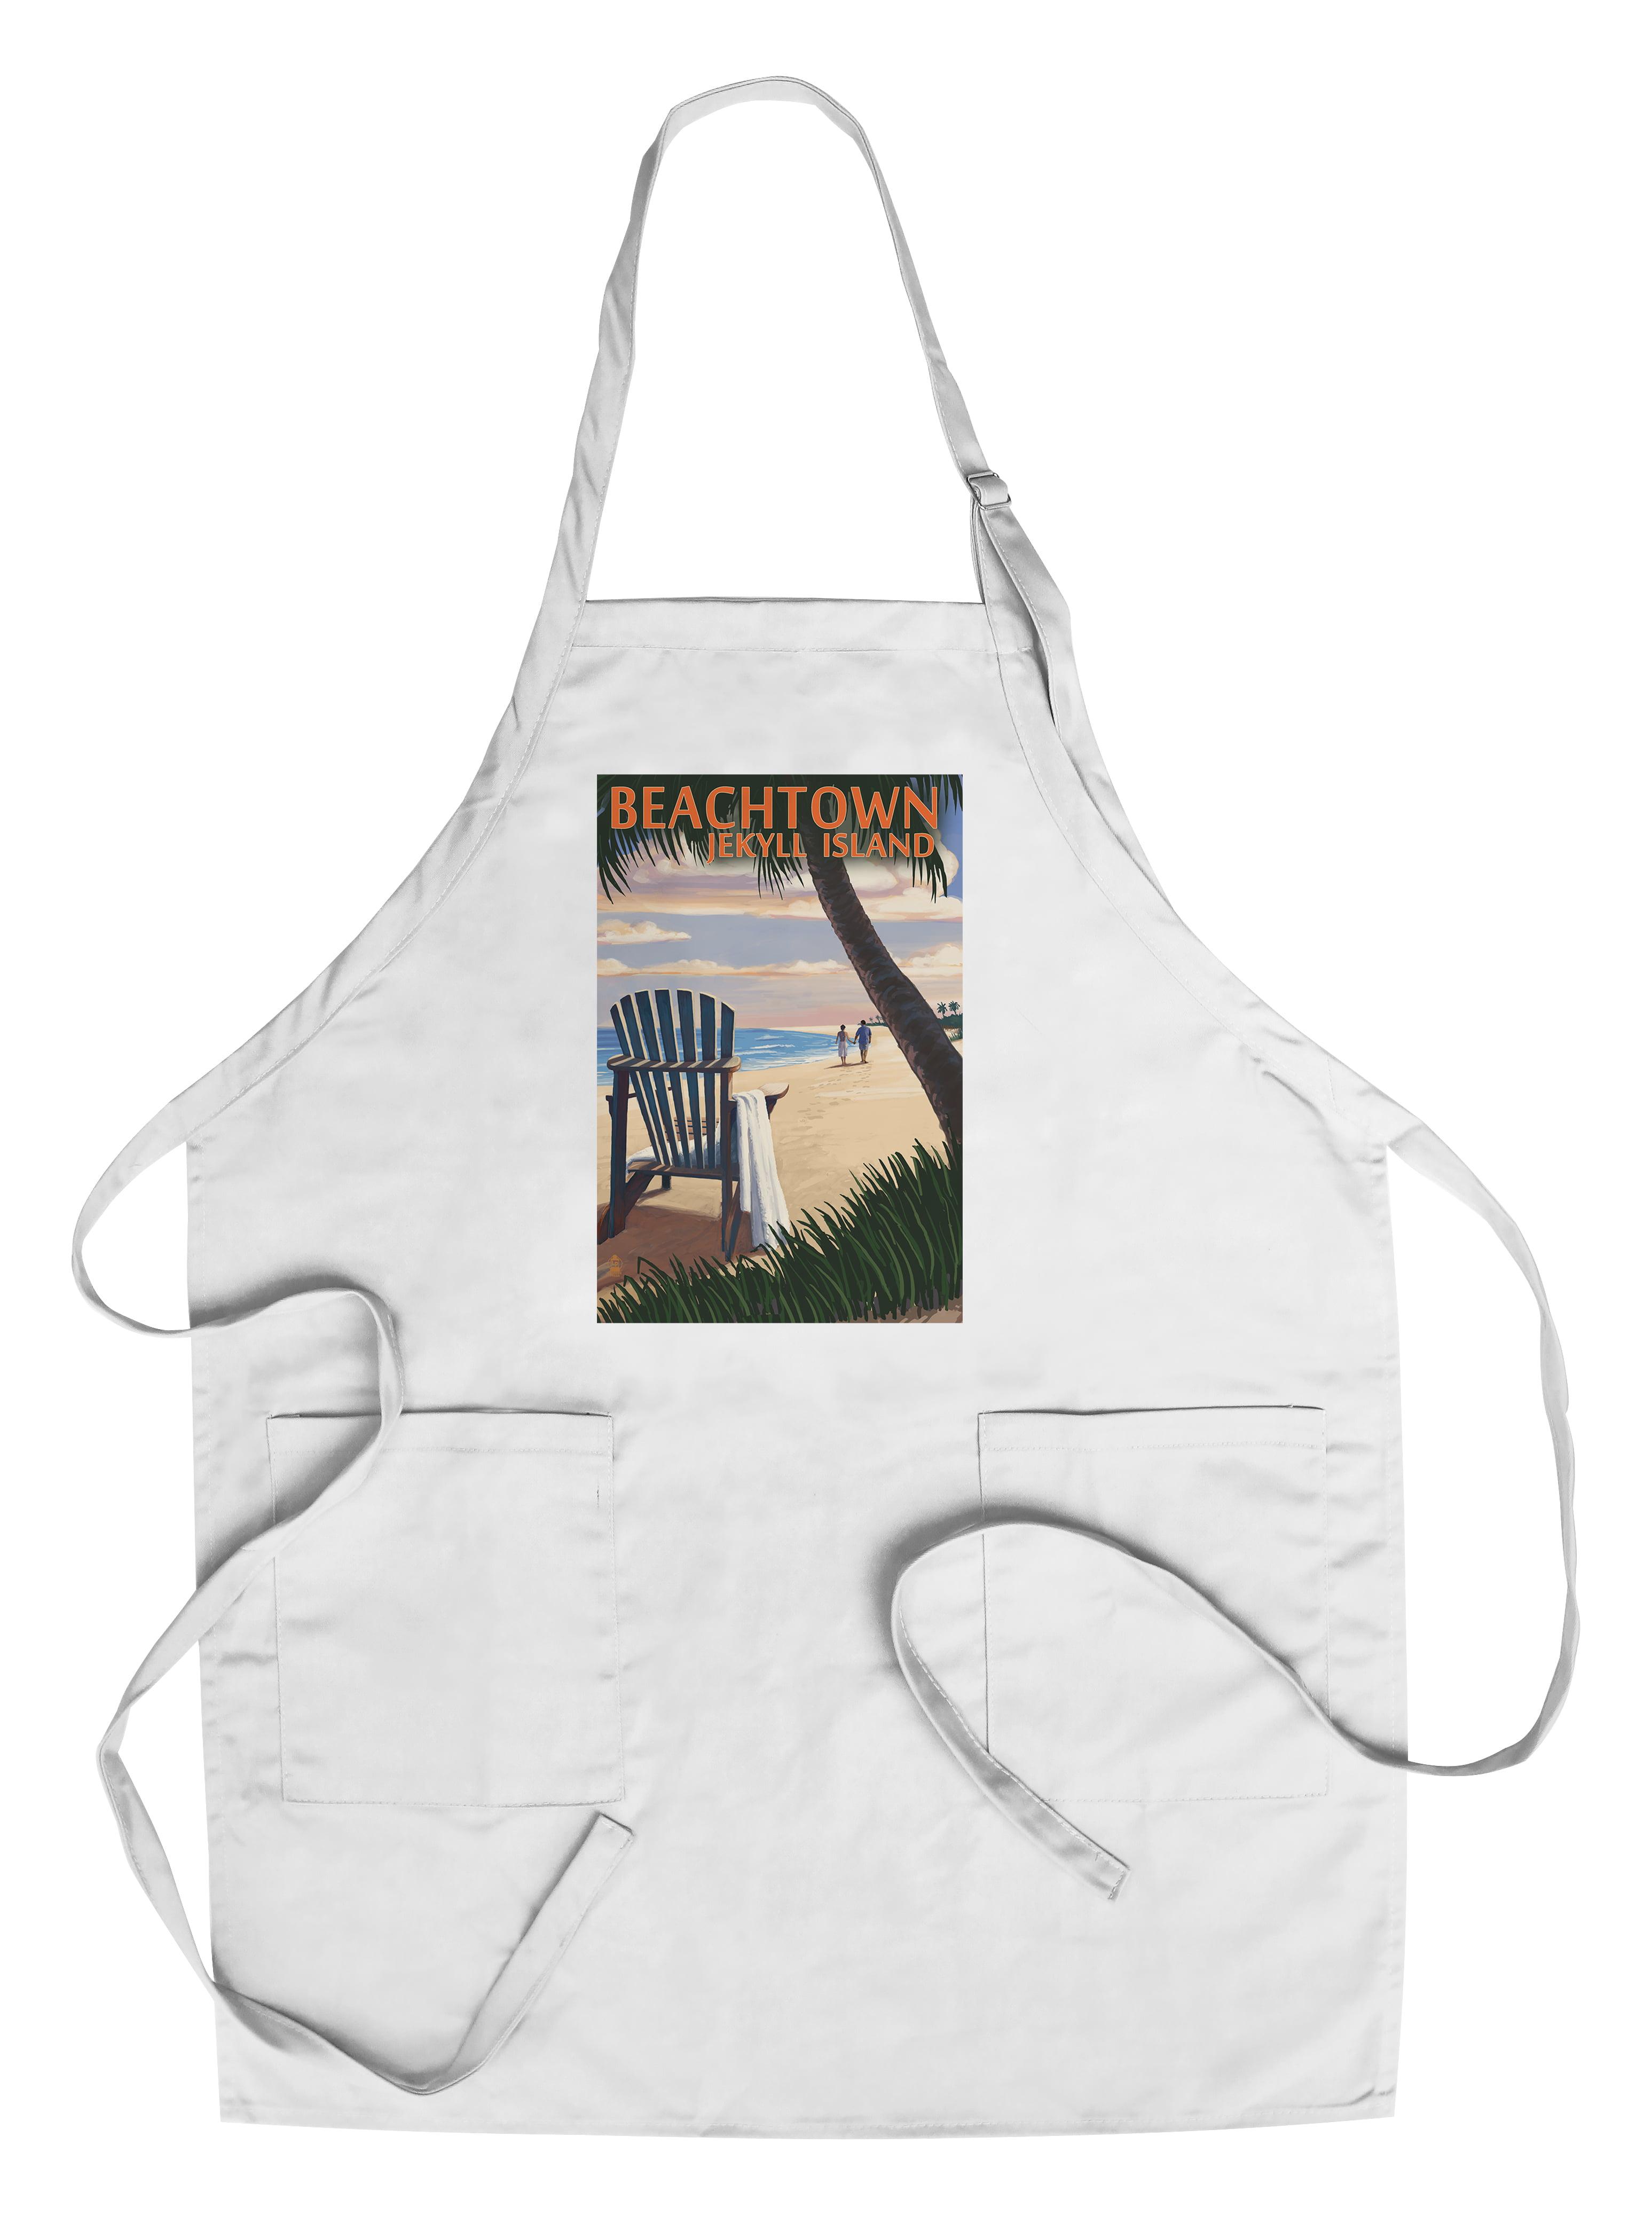 Beachtown Jekyll Island, Georgia Adirondack Chair on the Beach Lantern Press Poster (Cotton Polyester Chef's Apron) by Lantern Press